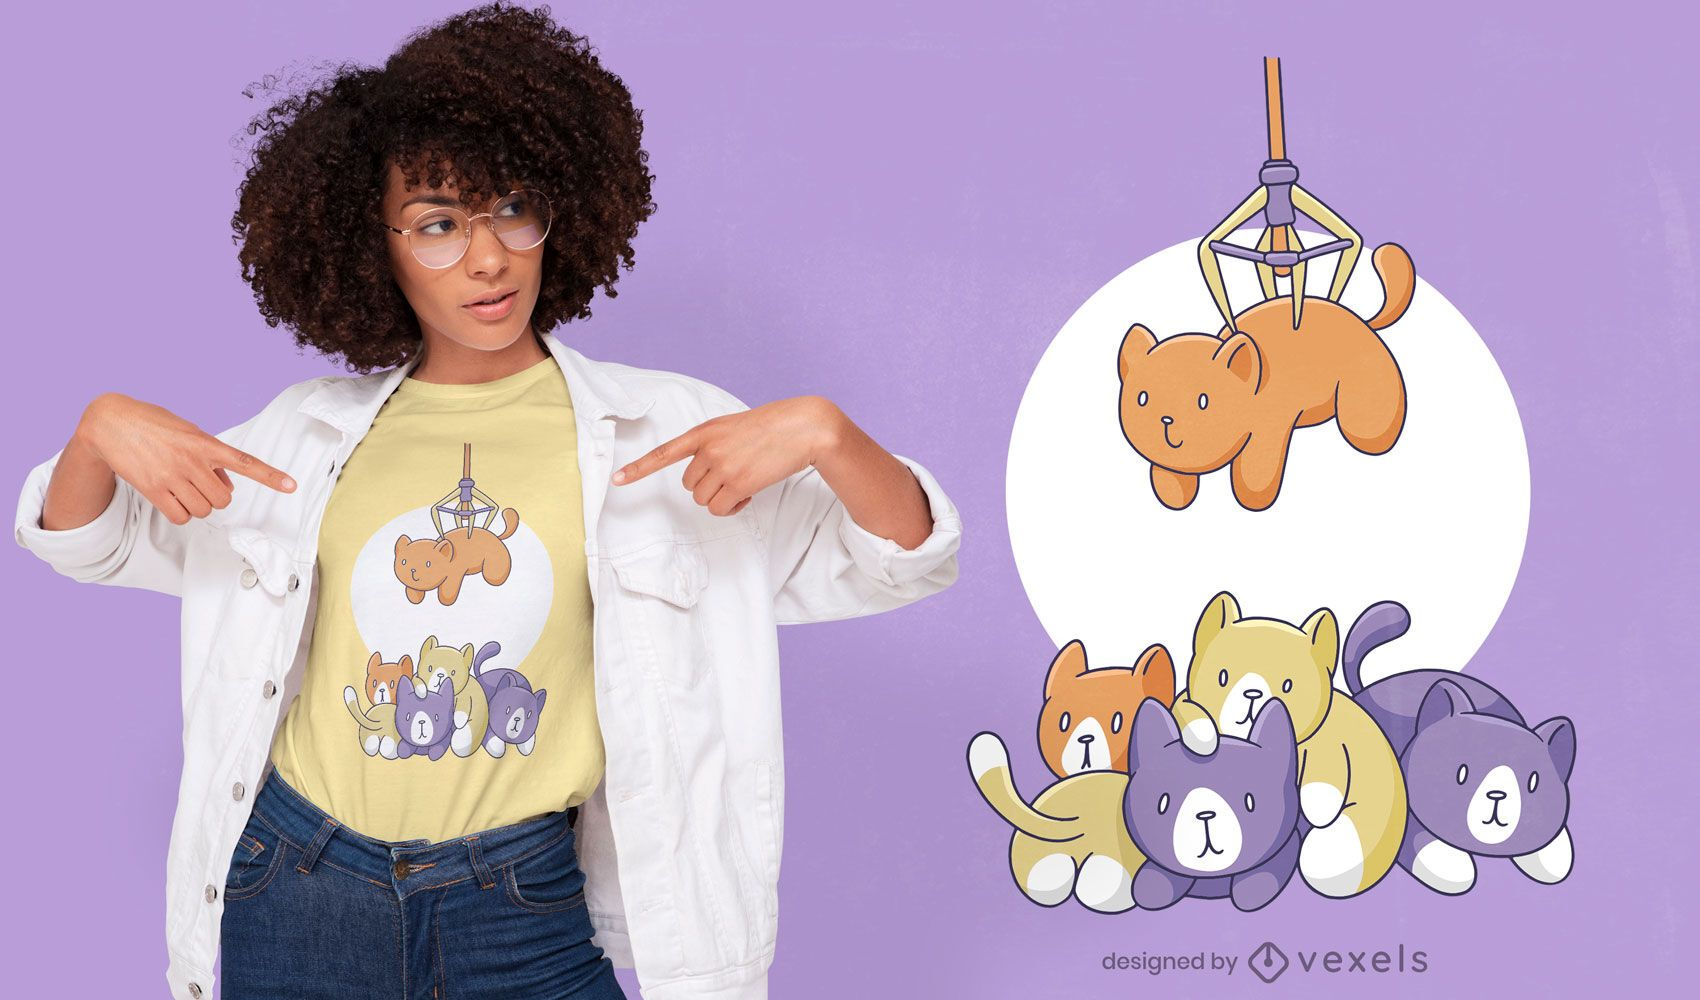 Dise?o de camiseta de m?quina de garra de gato lindo